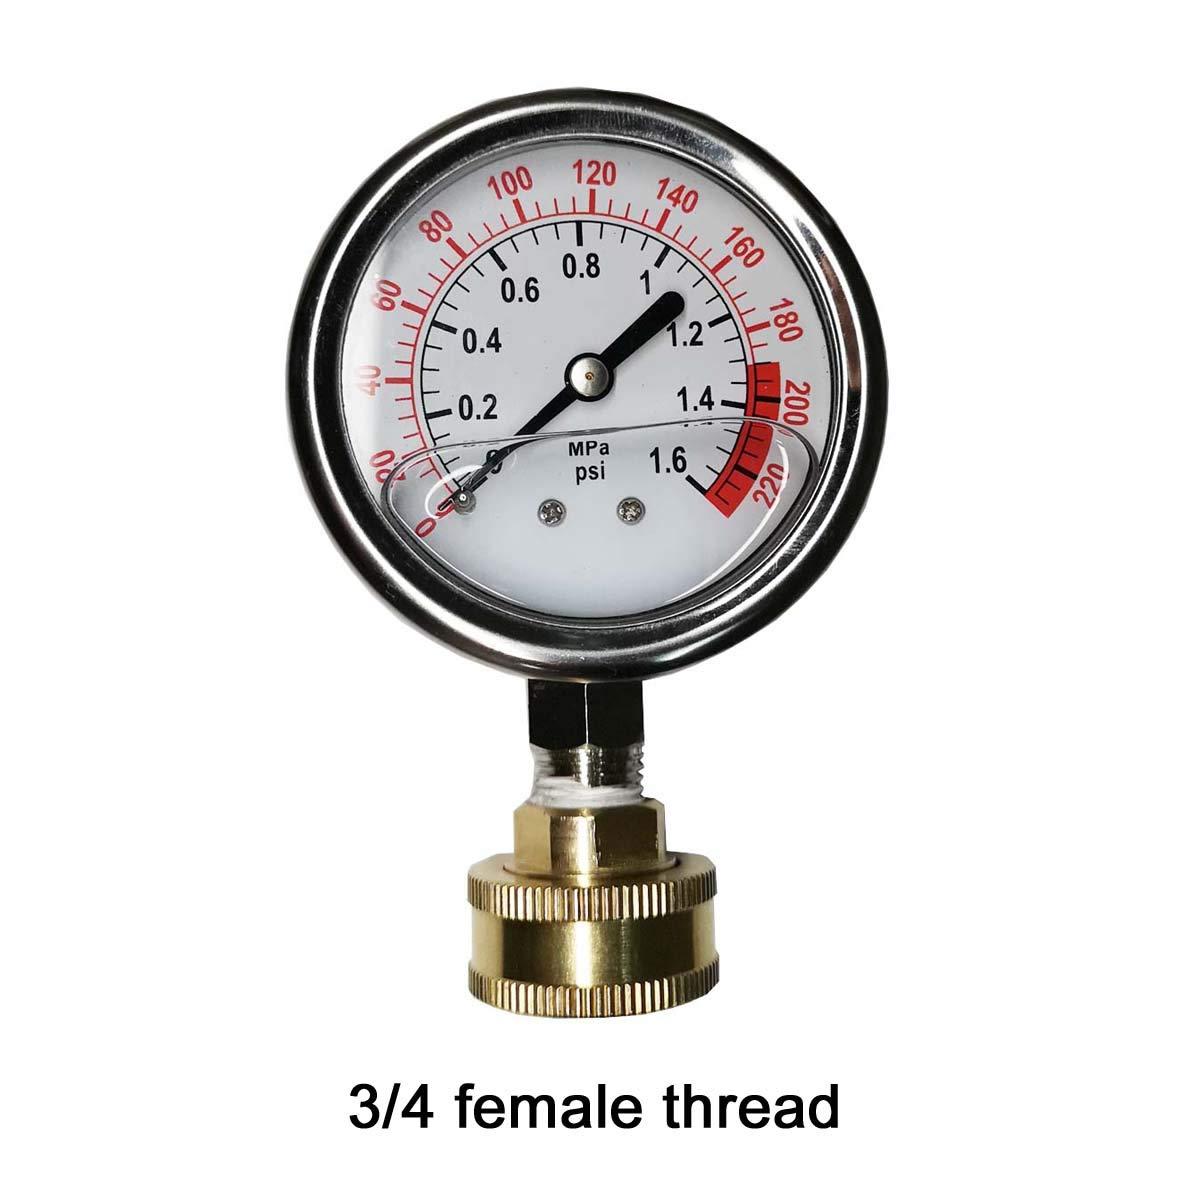 Excavator Diagnostic Hydraulic Pressure Gauge Tester Diagnostic Test